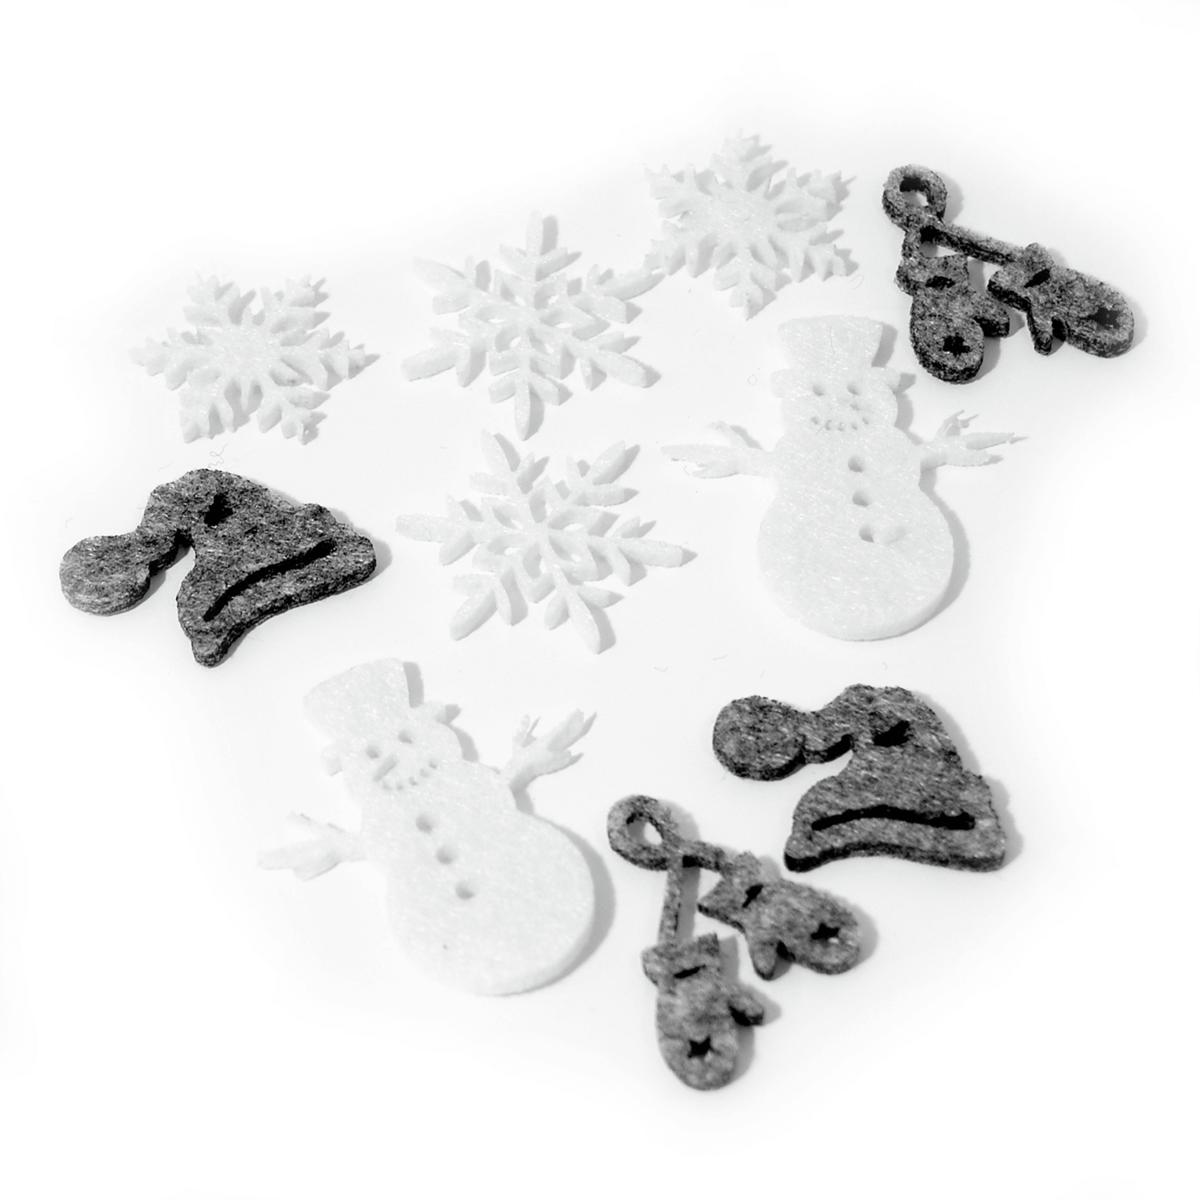 12 x Christmas Snowman Grey/White Embellishments Craft